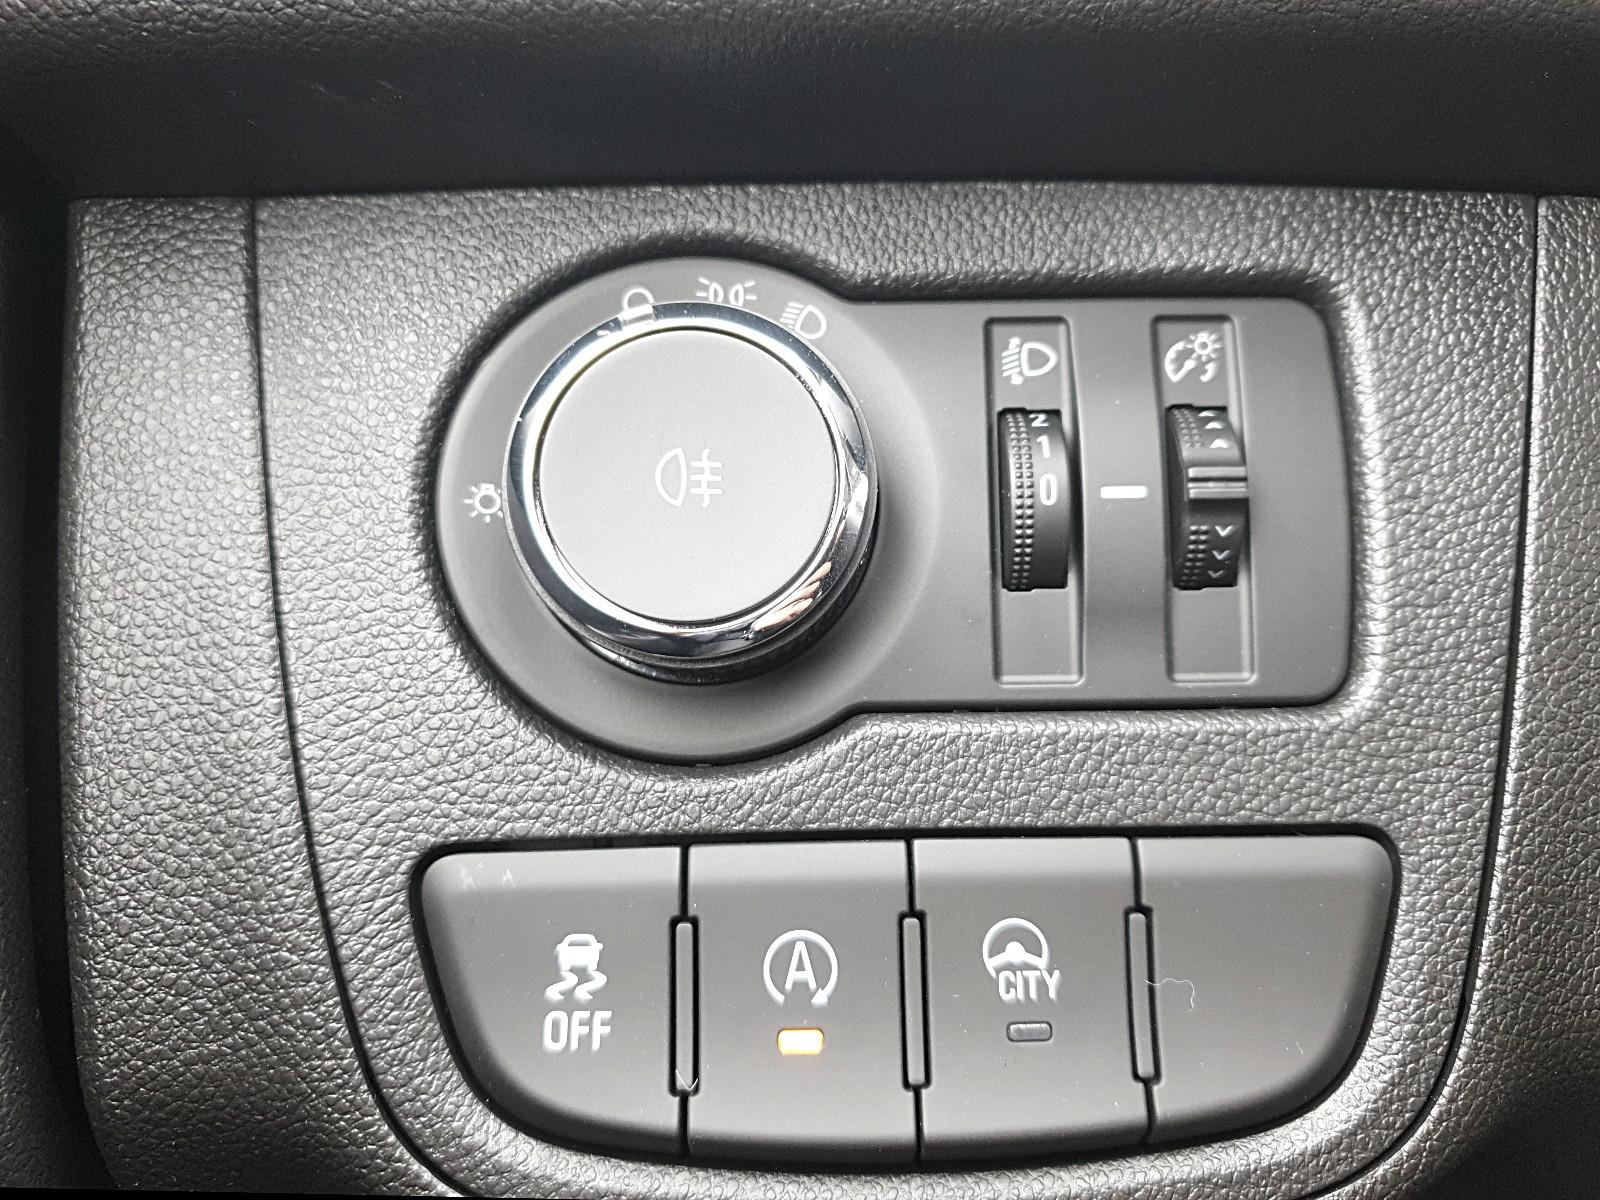 OPEL KARL 1.0 73PS Edition 5-Türig Klima Bluetooth Tempomat 5-Sitzer Viscaal Fahrzeuggrosshandel GmbH, D-49847 Itterbeck